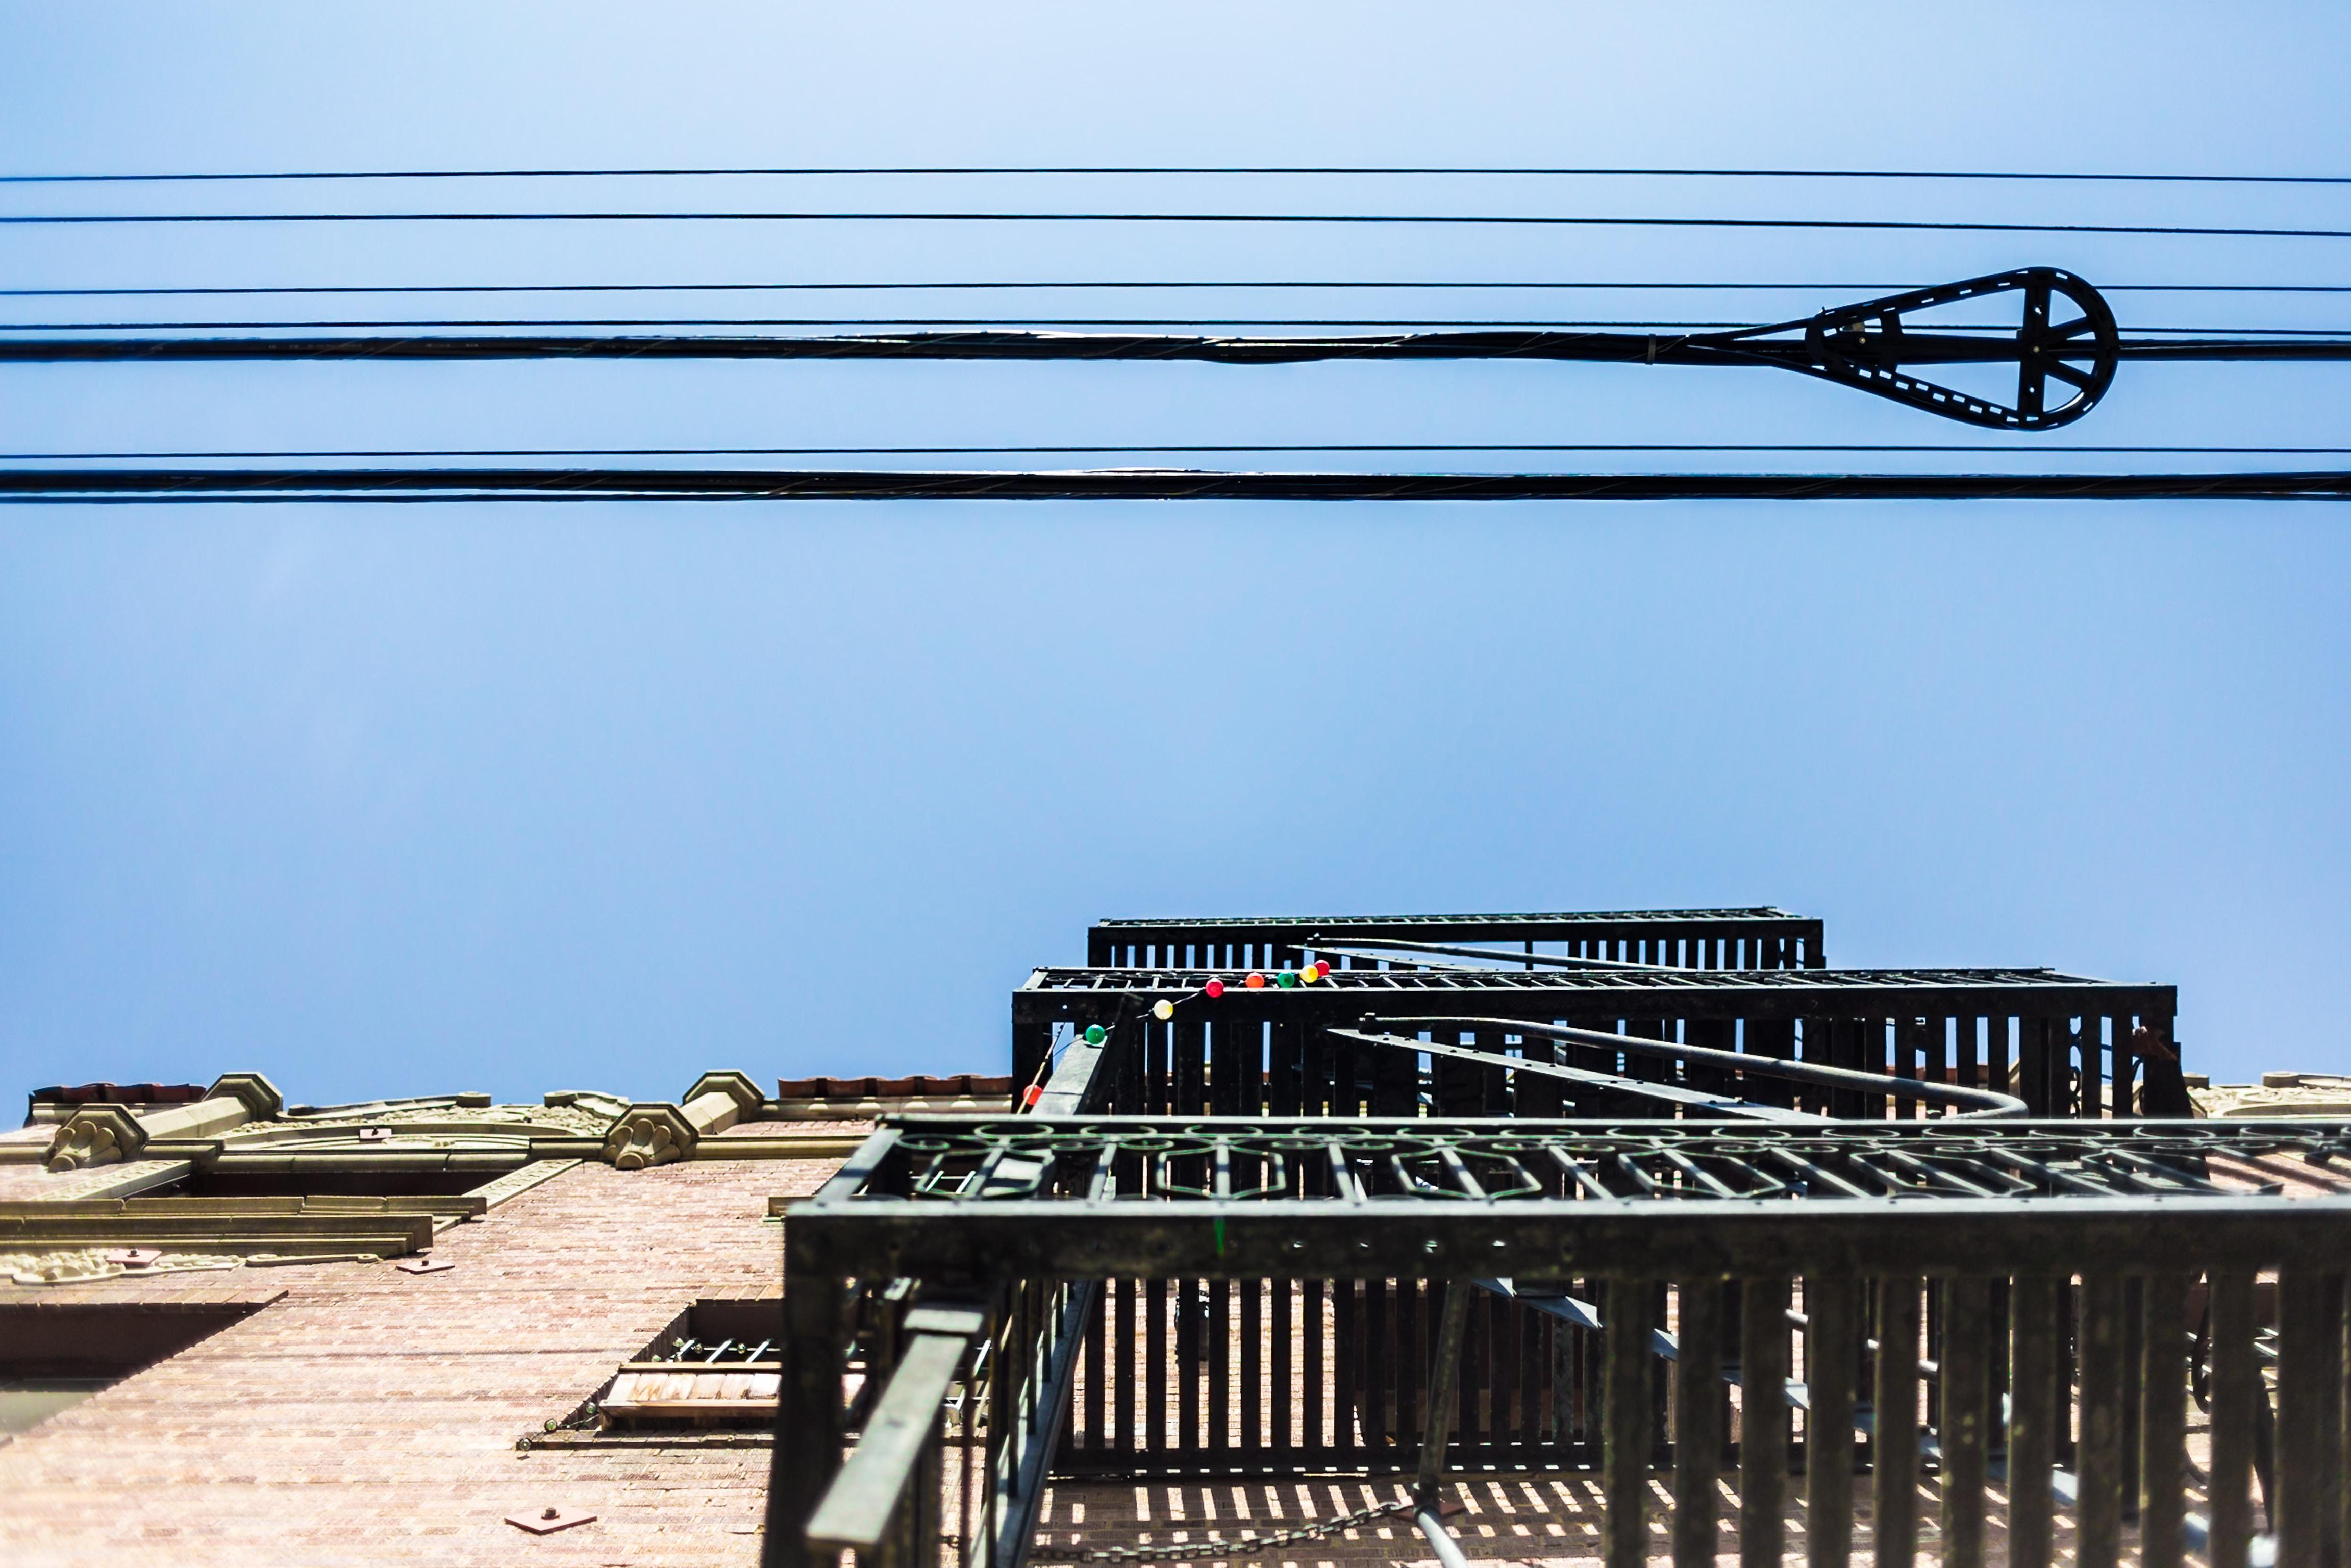 gray metal frames under black cables at daytime